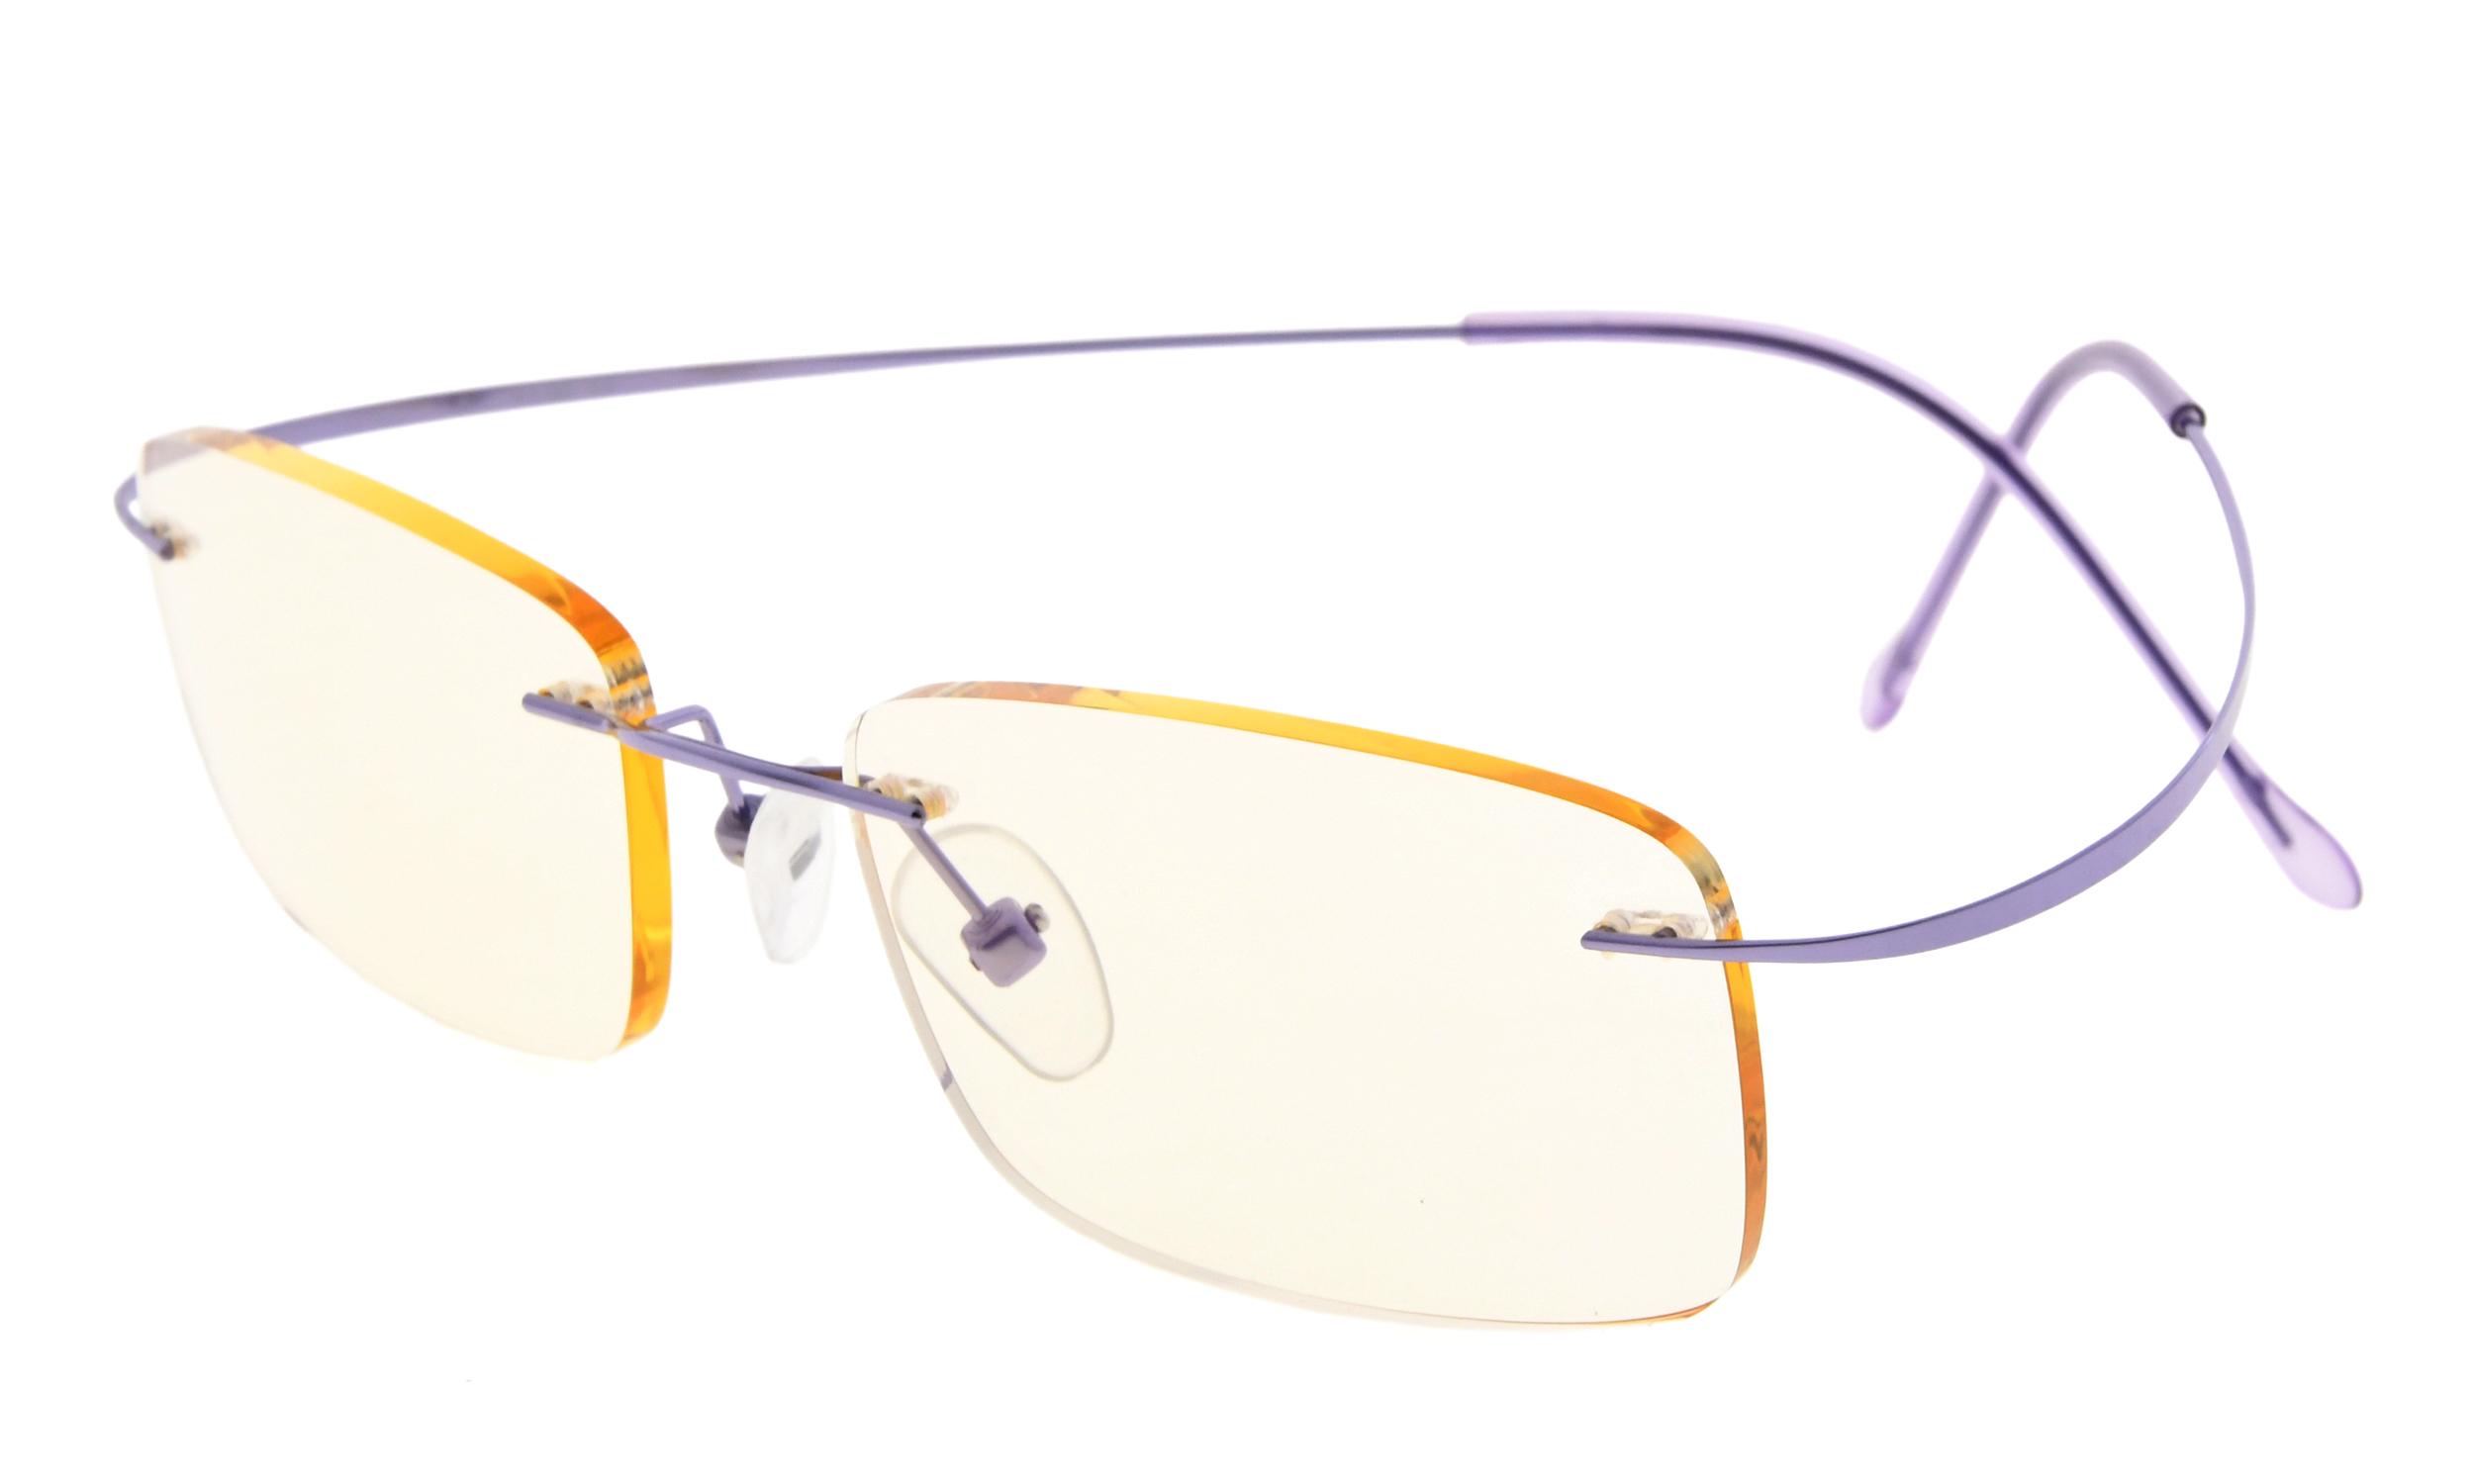 633cefc43559 Eyekepper Computer Reading Glasses UV Protection Titanium Rimless Stylish Readers  Women Men Purple CG1508